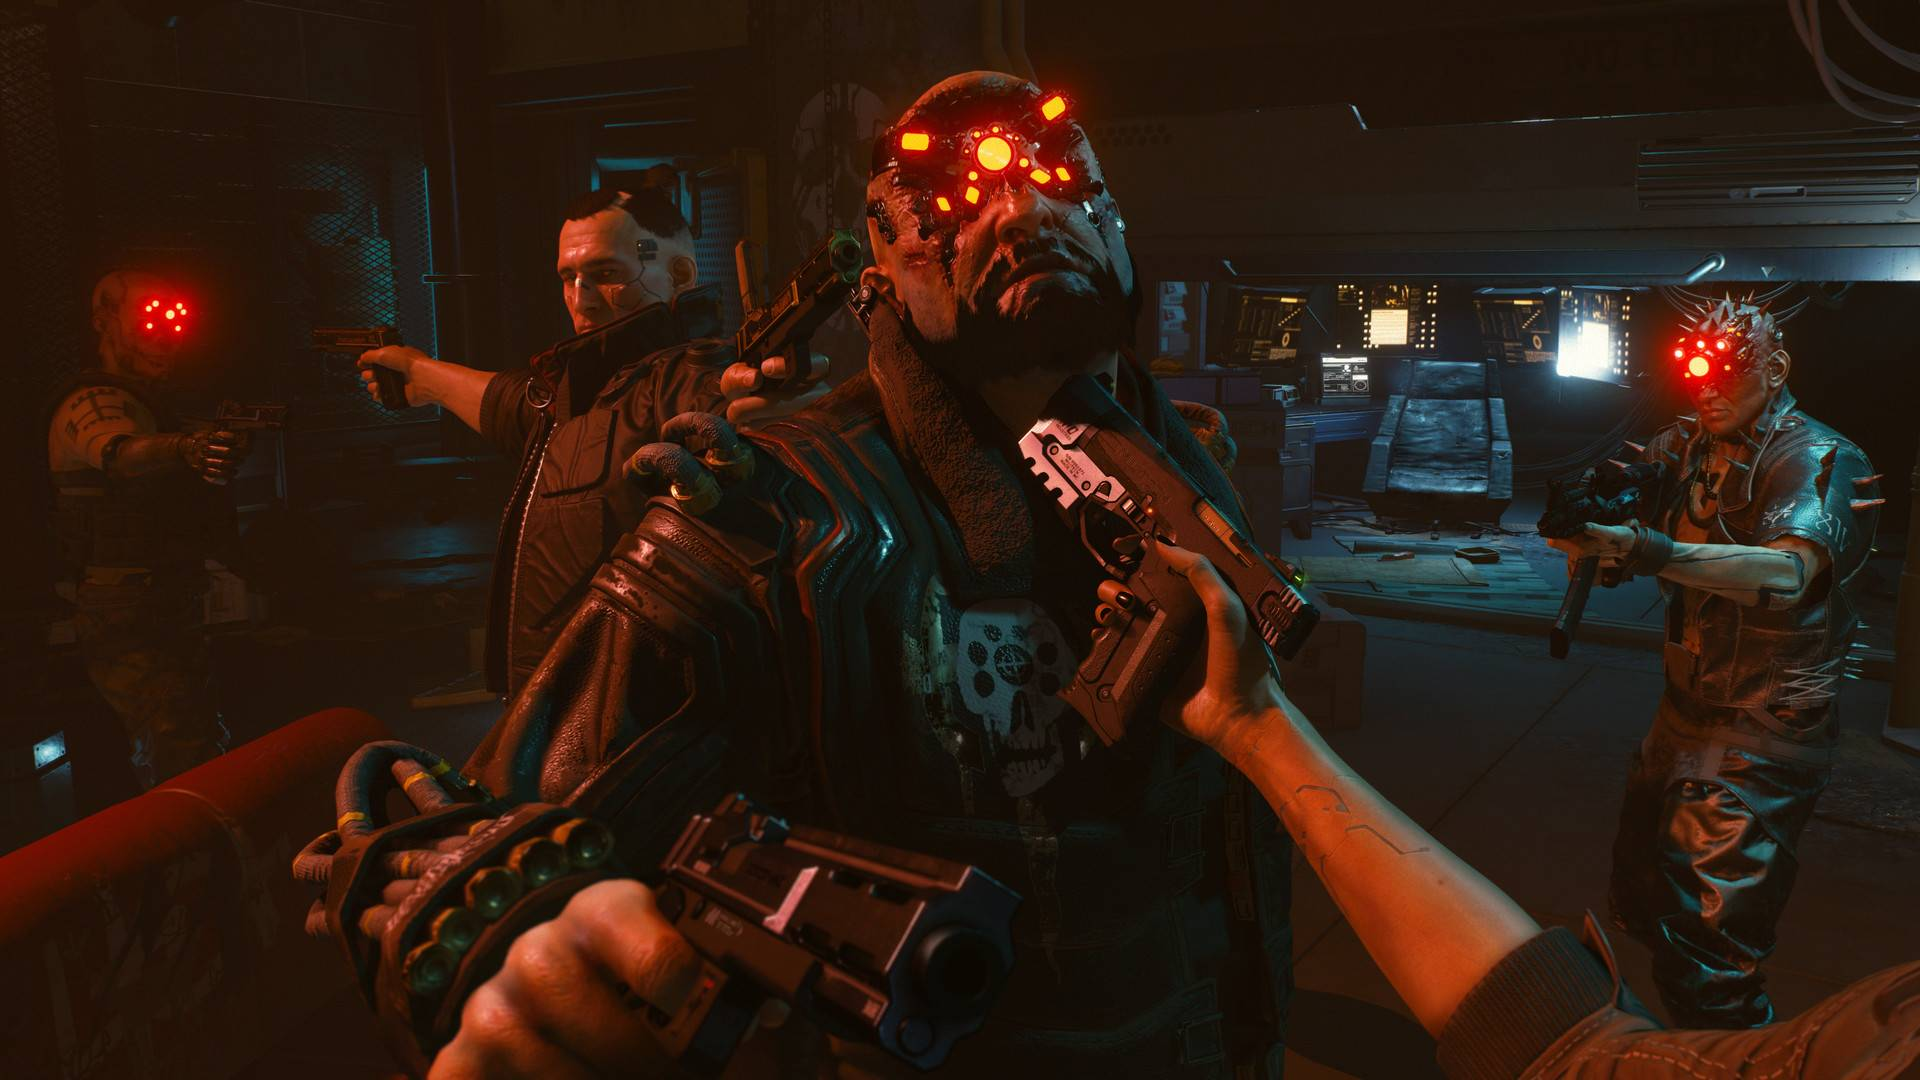 Cyberpunk 2077 hotfix addresses critical security bug